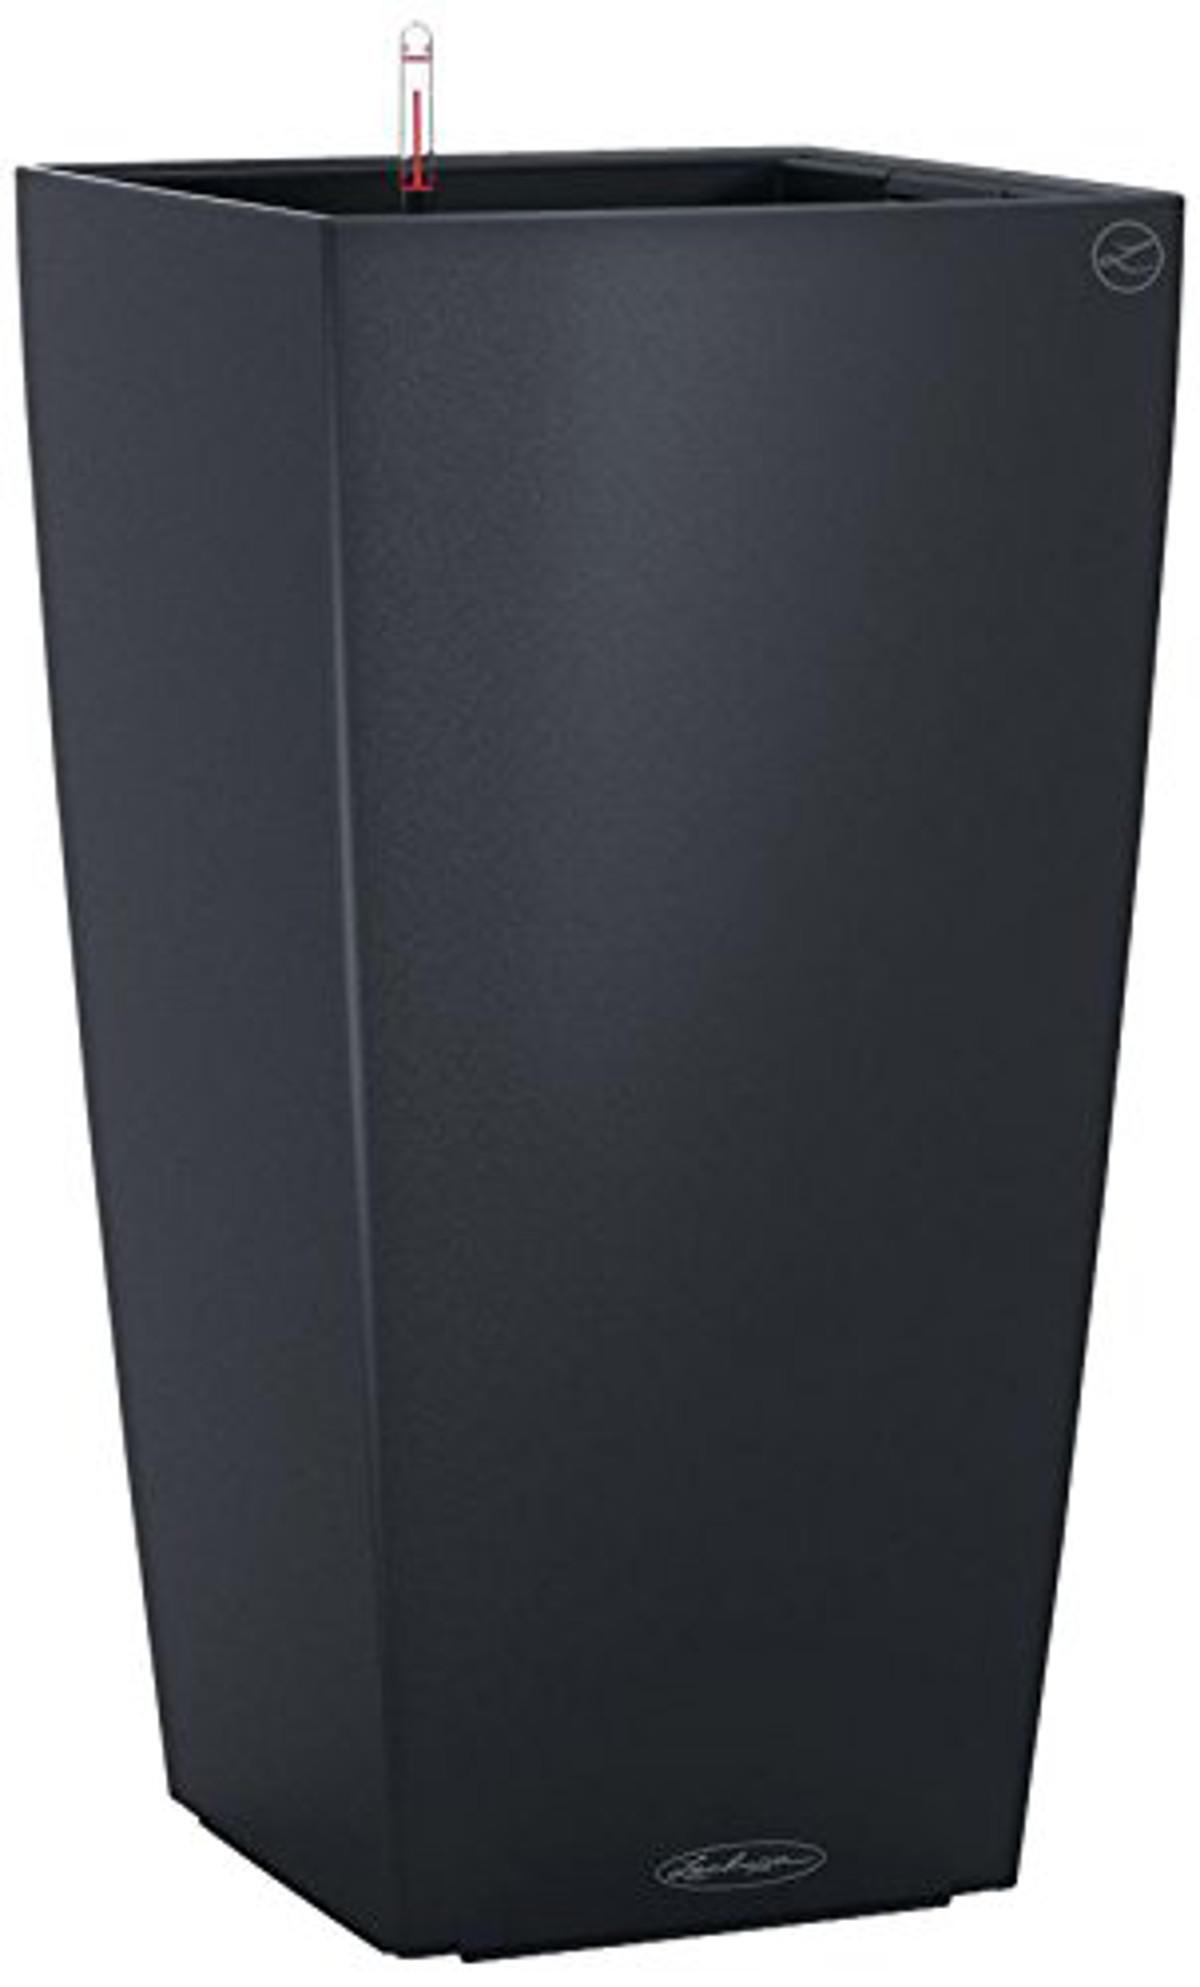 Vaso Cubico Color in polipropilene colore grigio H 56 x L 30 - 2